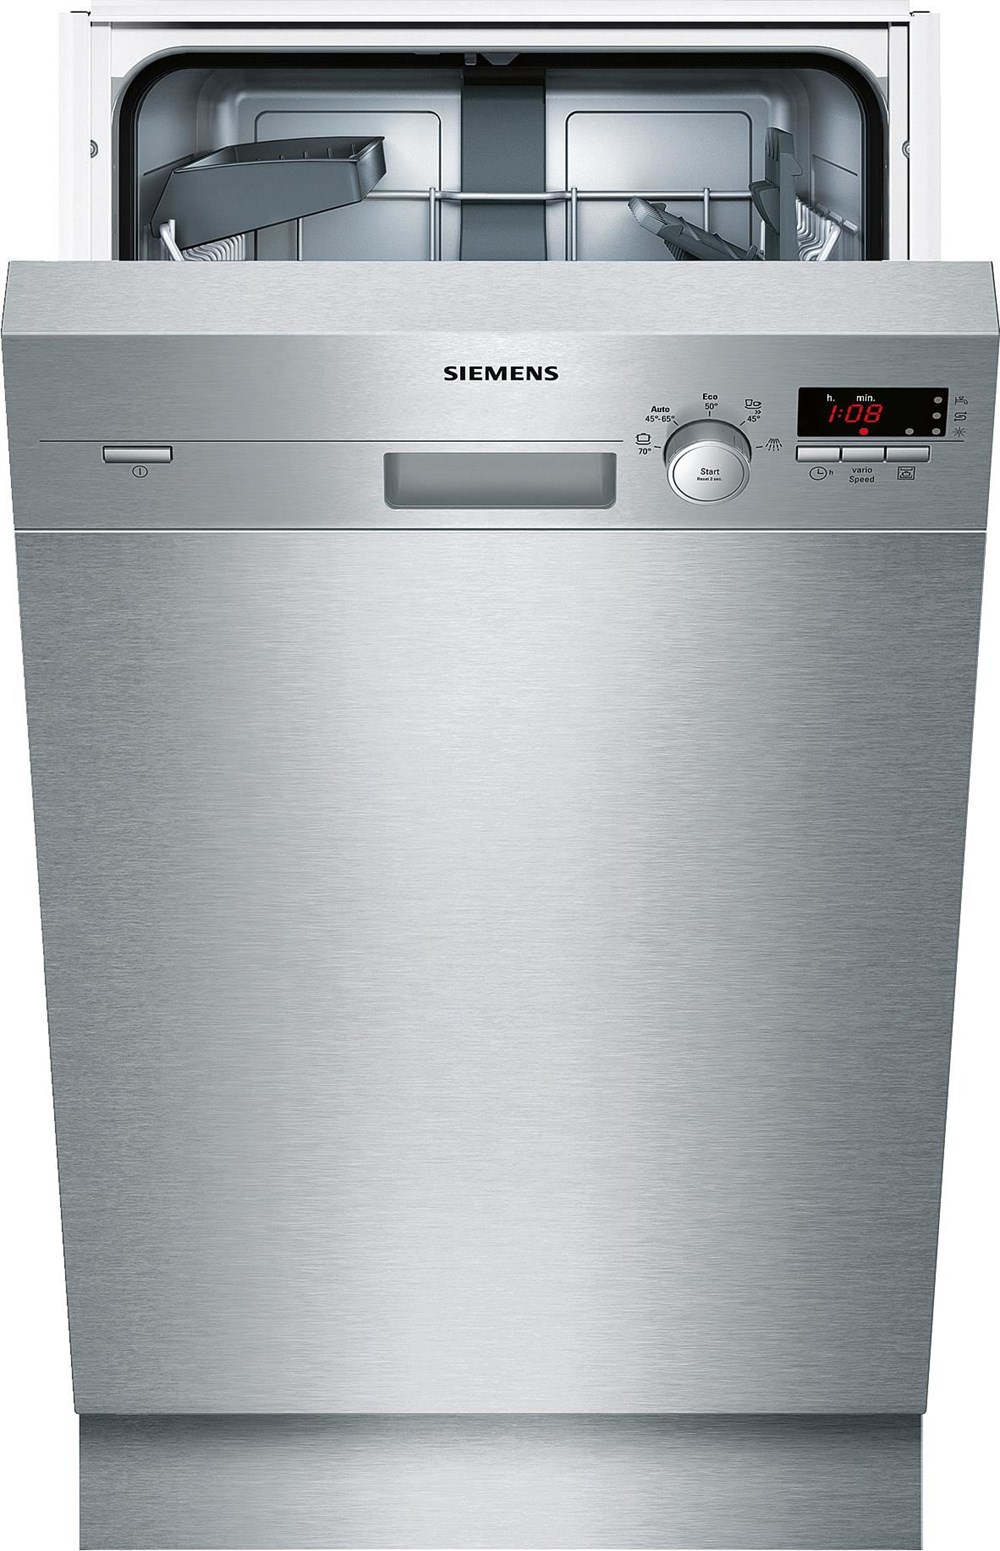 Siemens SR45E507EU iQ300 A+ Unterbauspüler, 45cm edelstahl (EEK: A+)